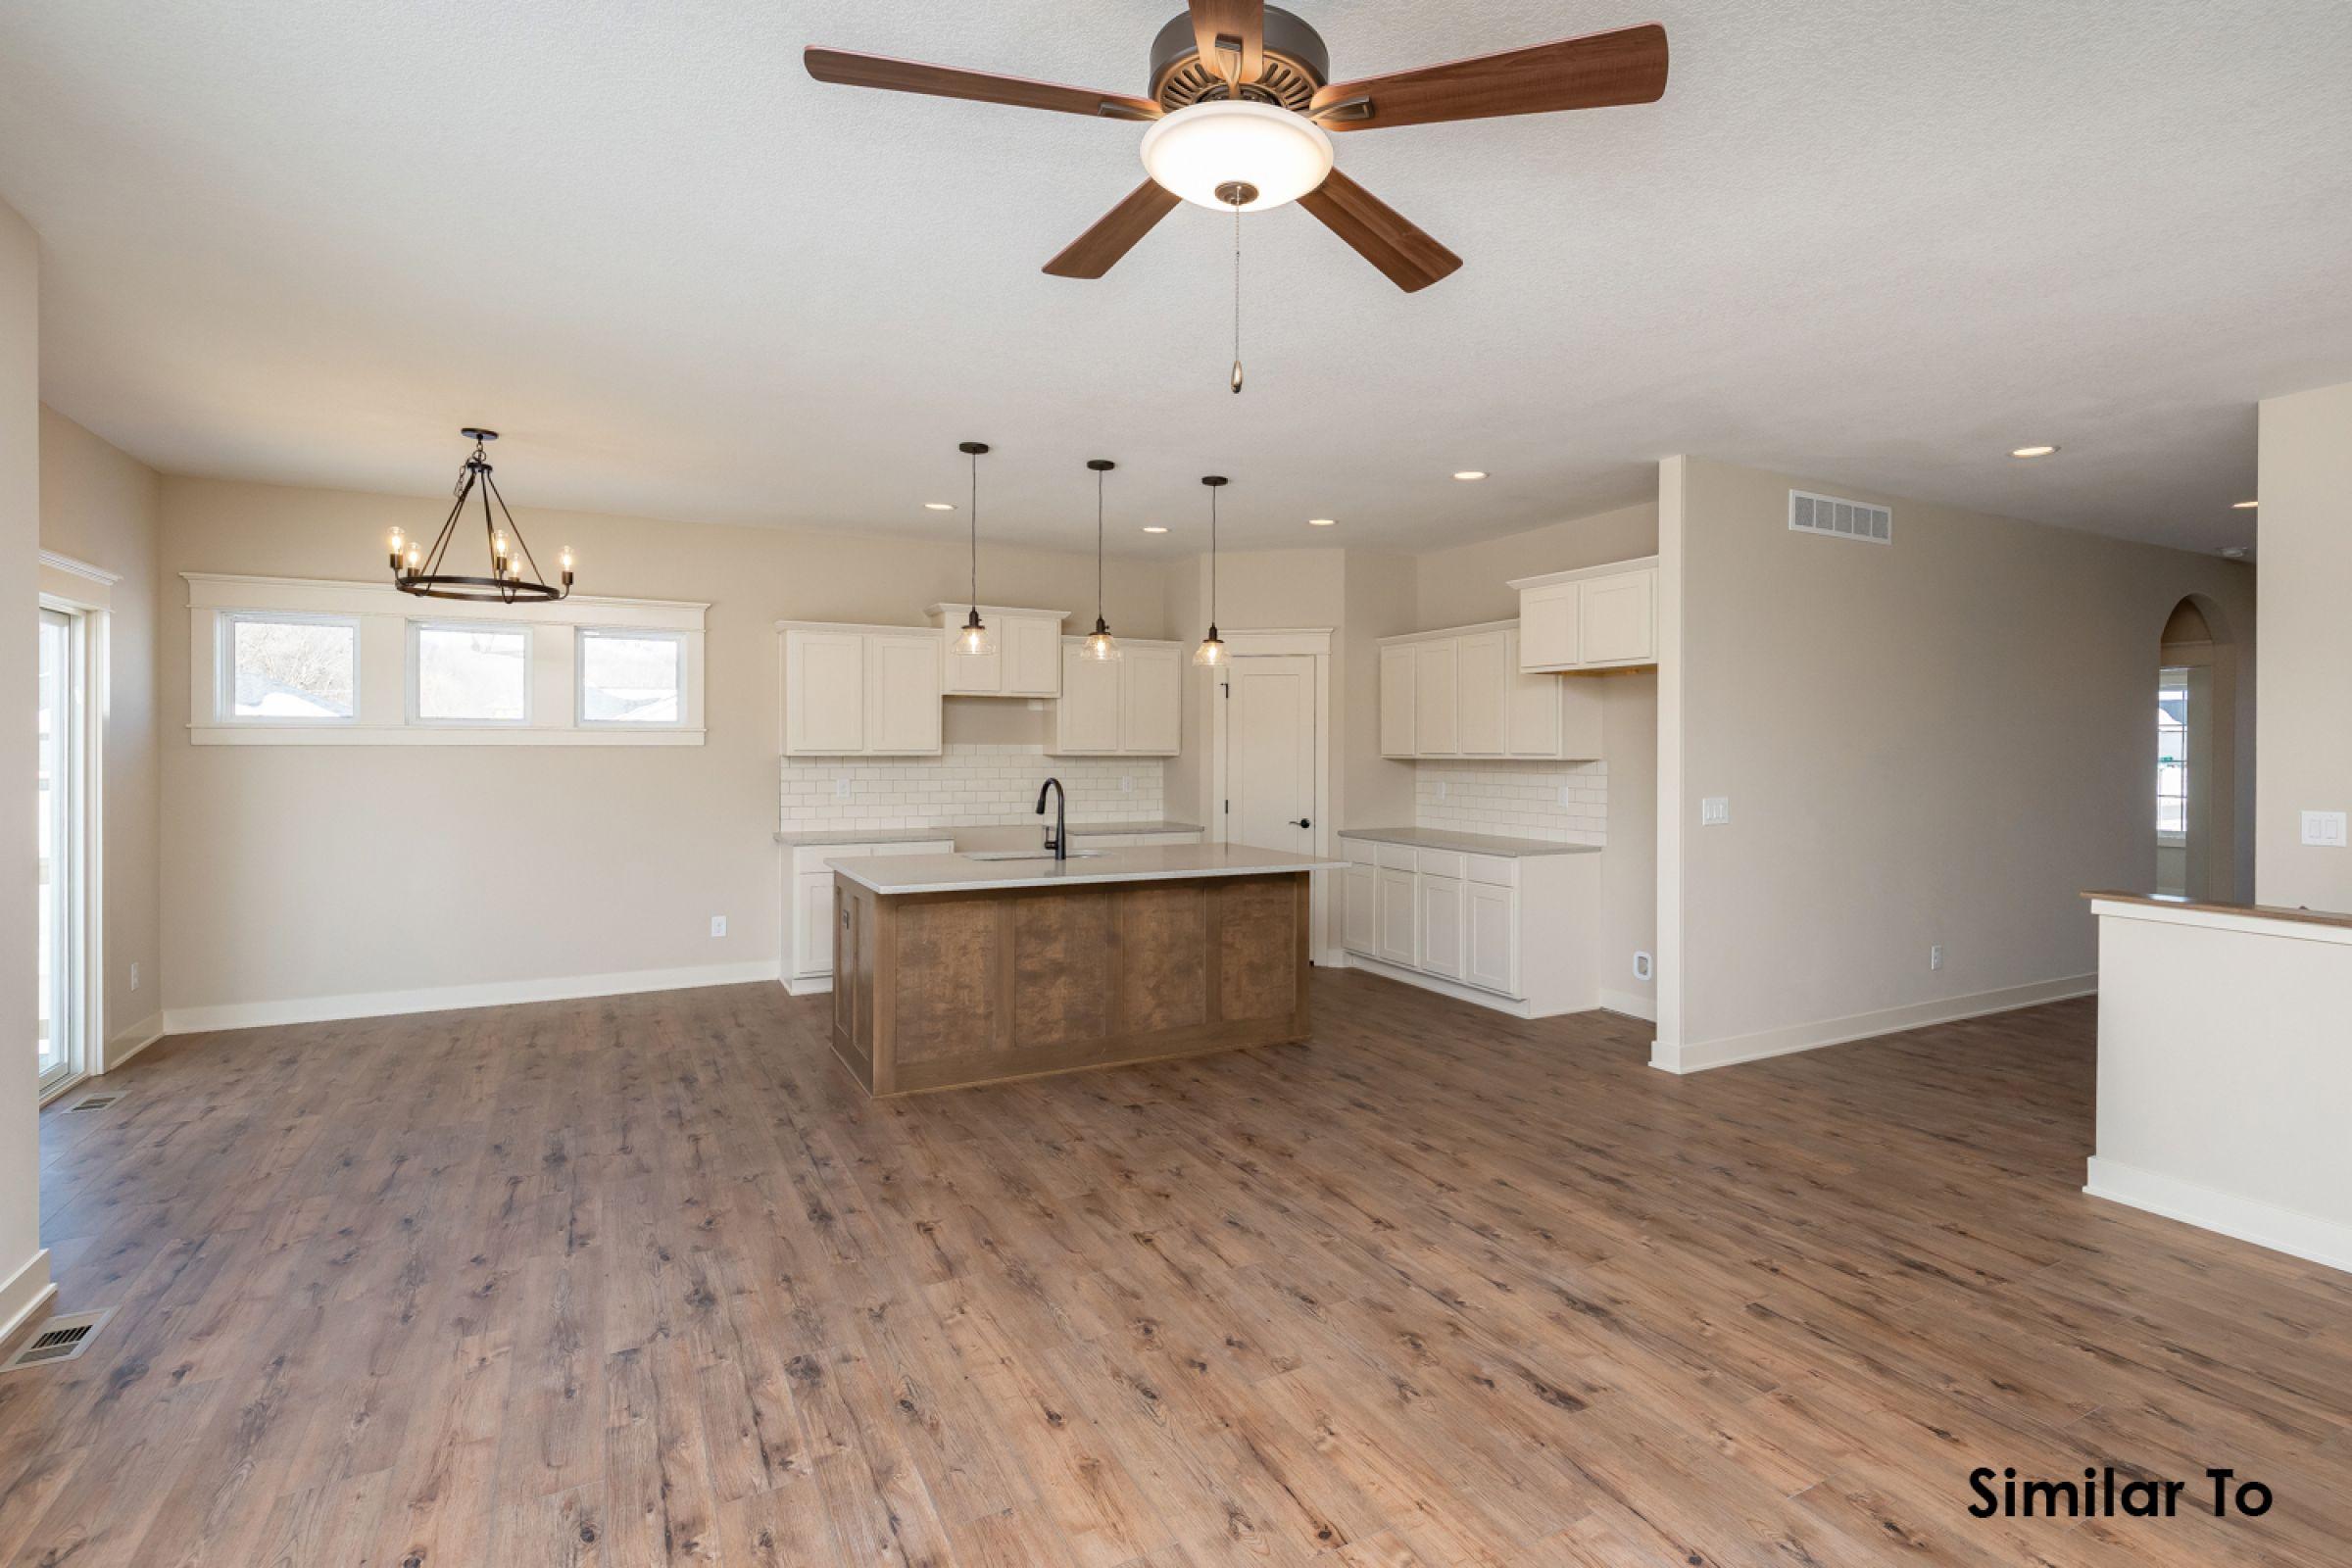 residential-warren-county-iowa-1-acres-listing-number-14995-11-2020-08-03-165352.jpg